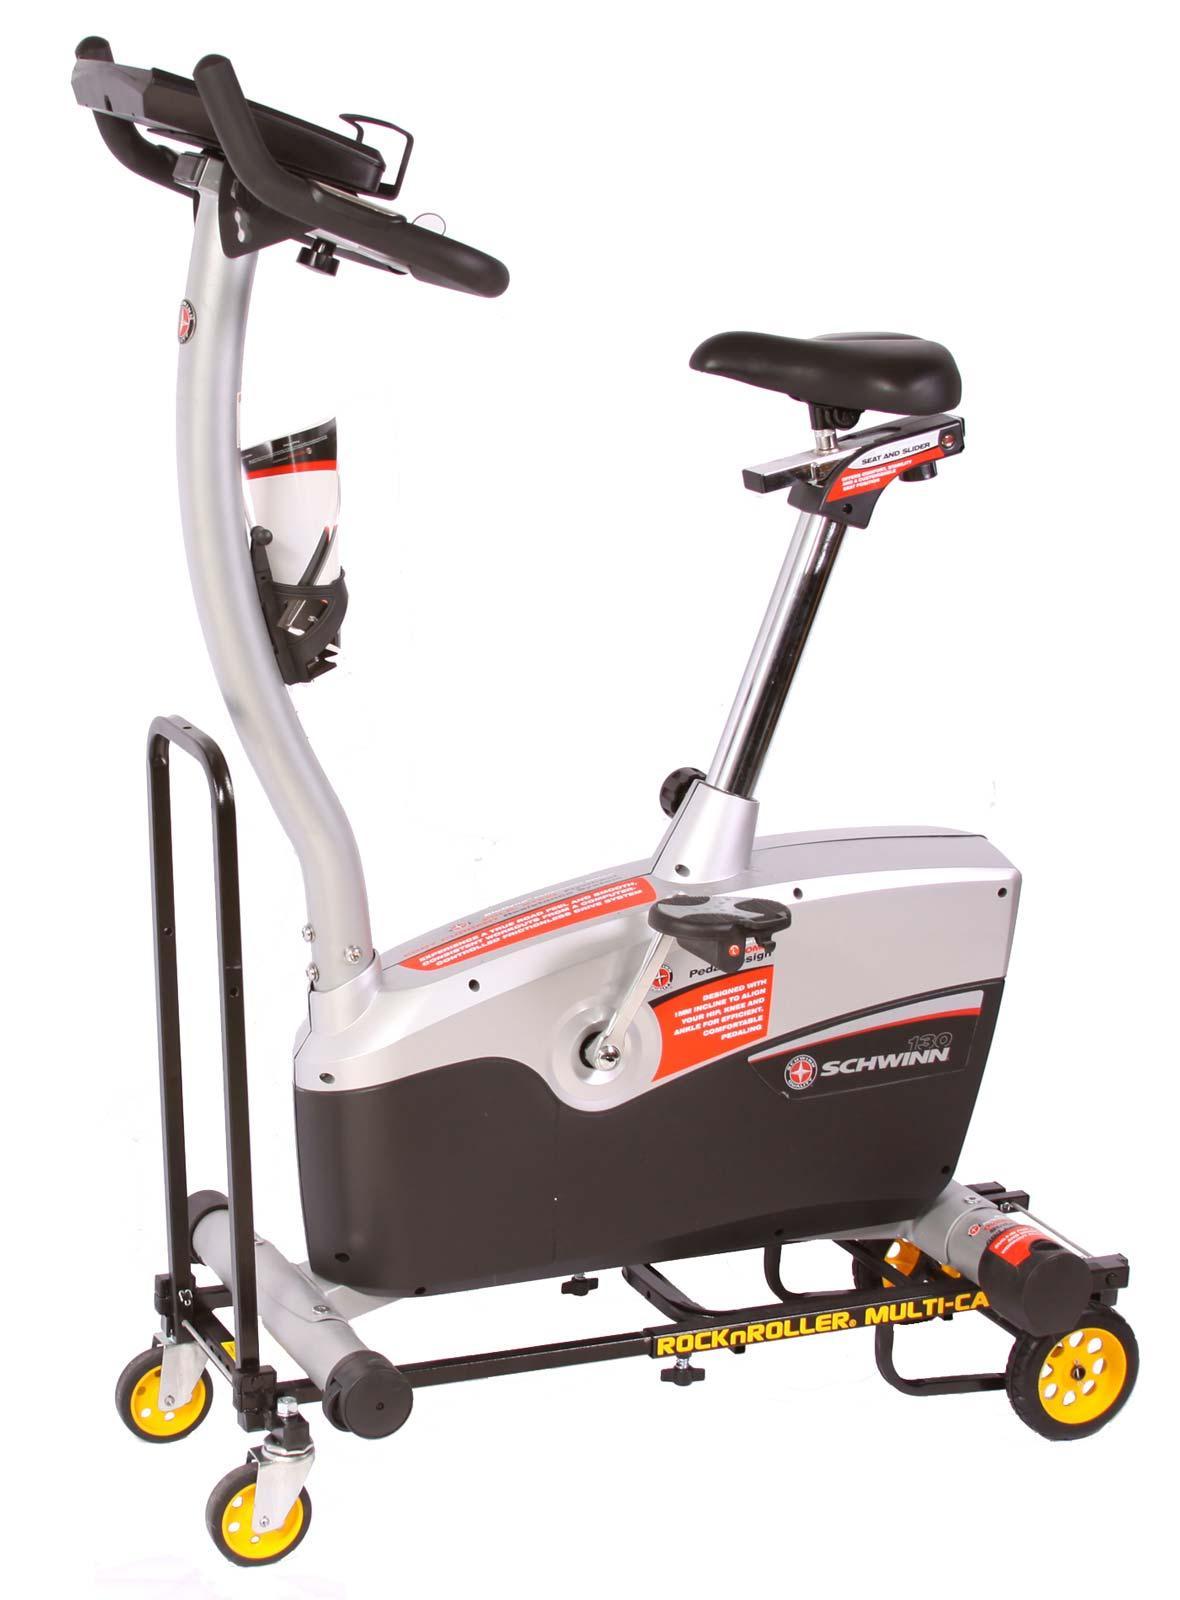 rock n roller r2rt micro multi cart w r trac wheels. Black Bedroom Furniture Sets. Home Design Ideas